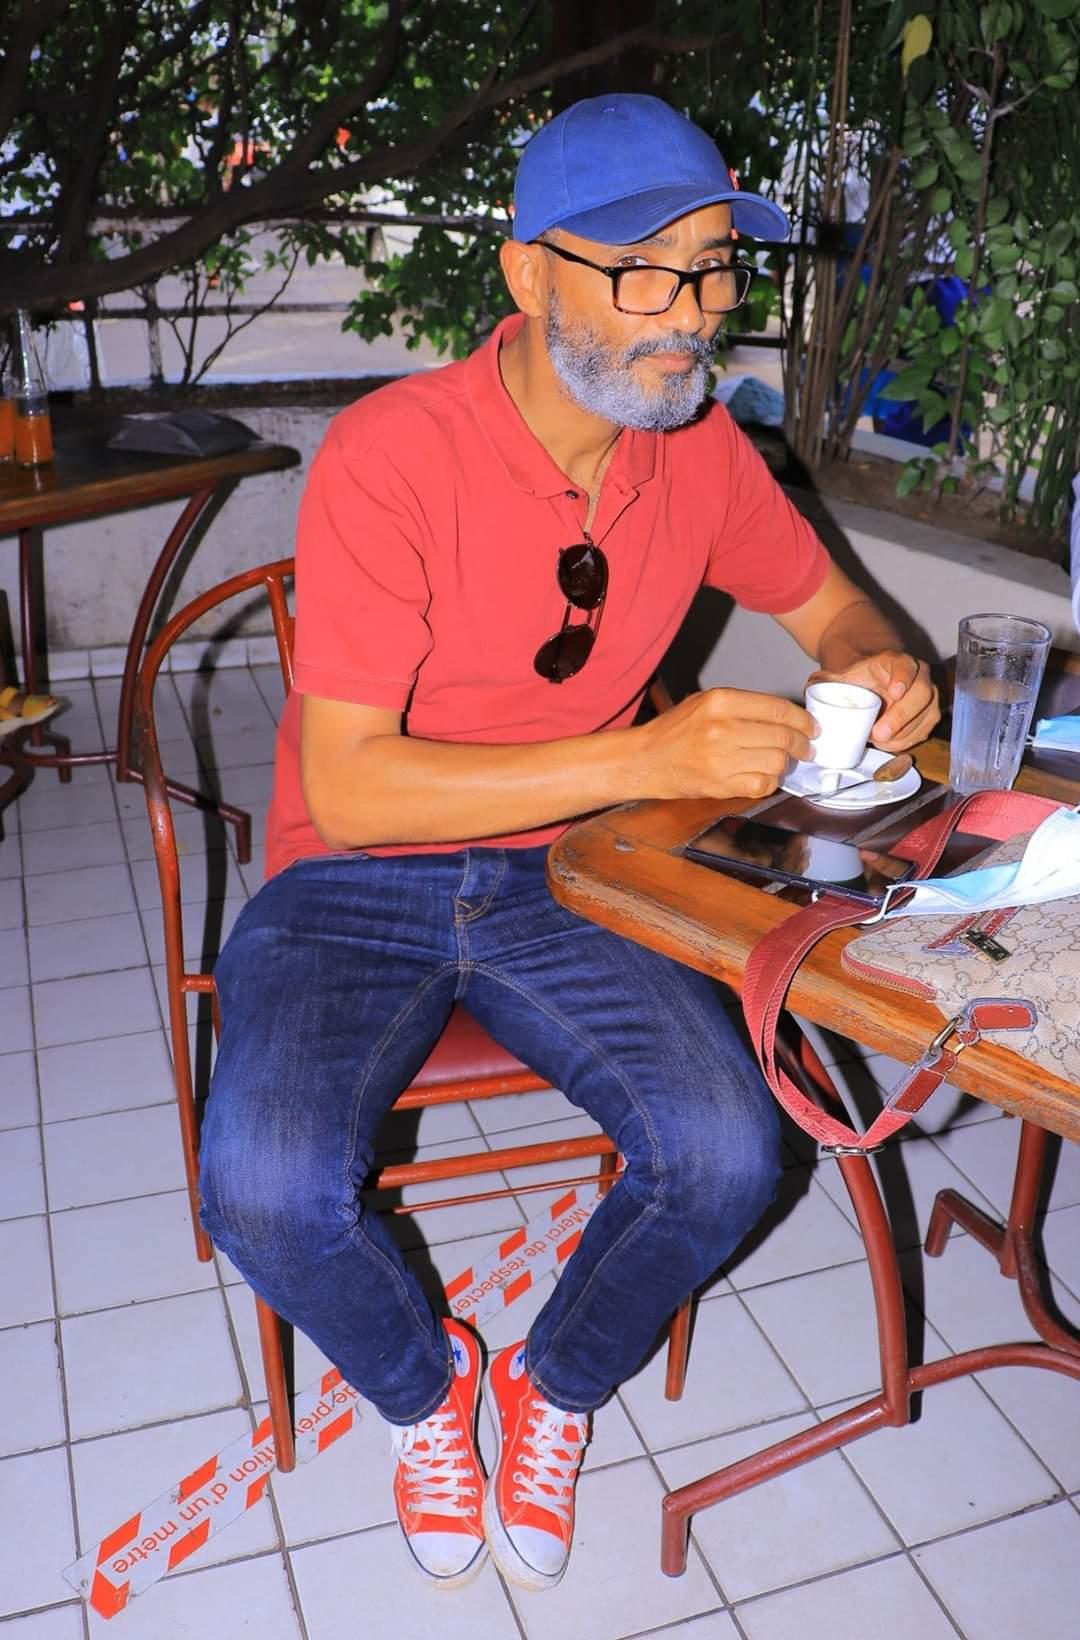 M. Serge Abslow